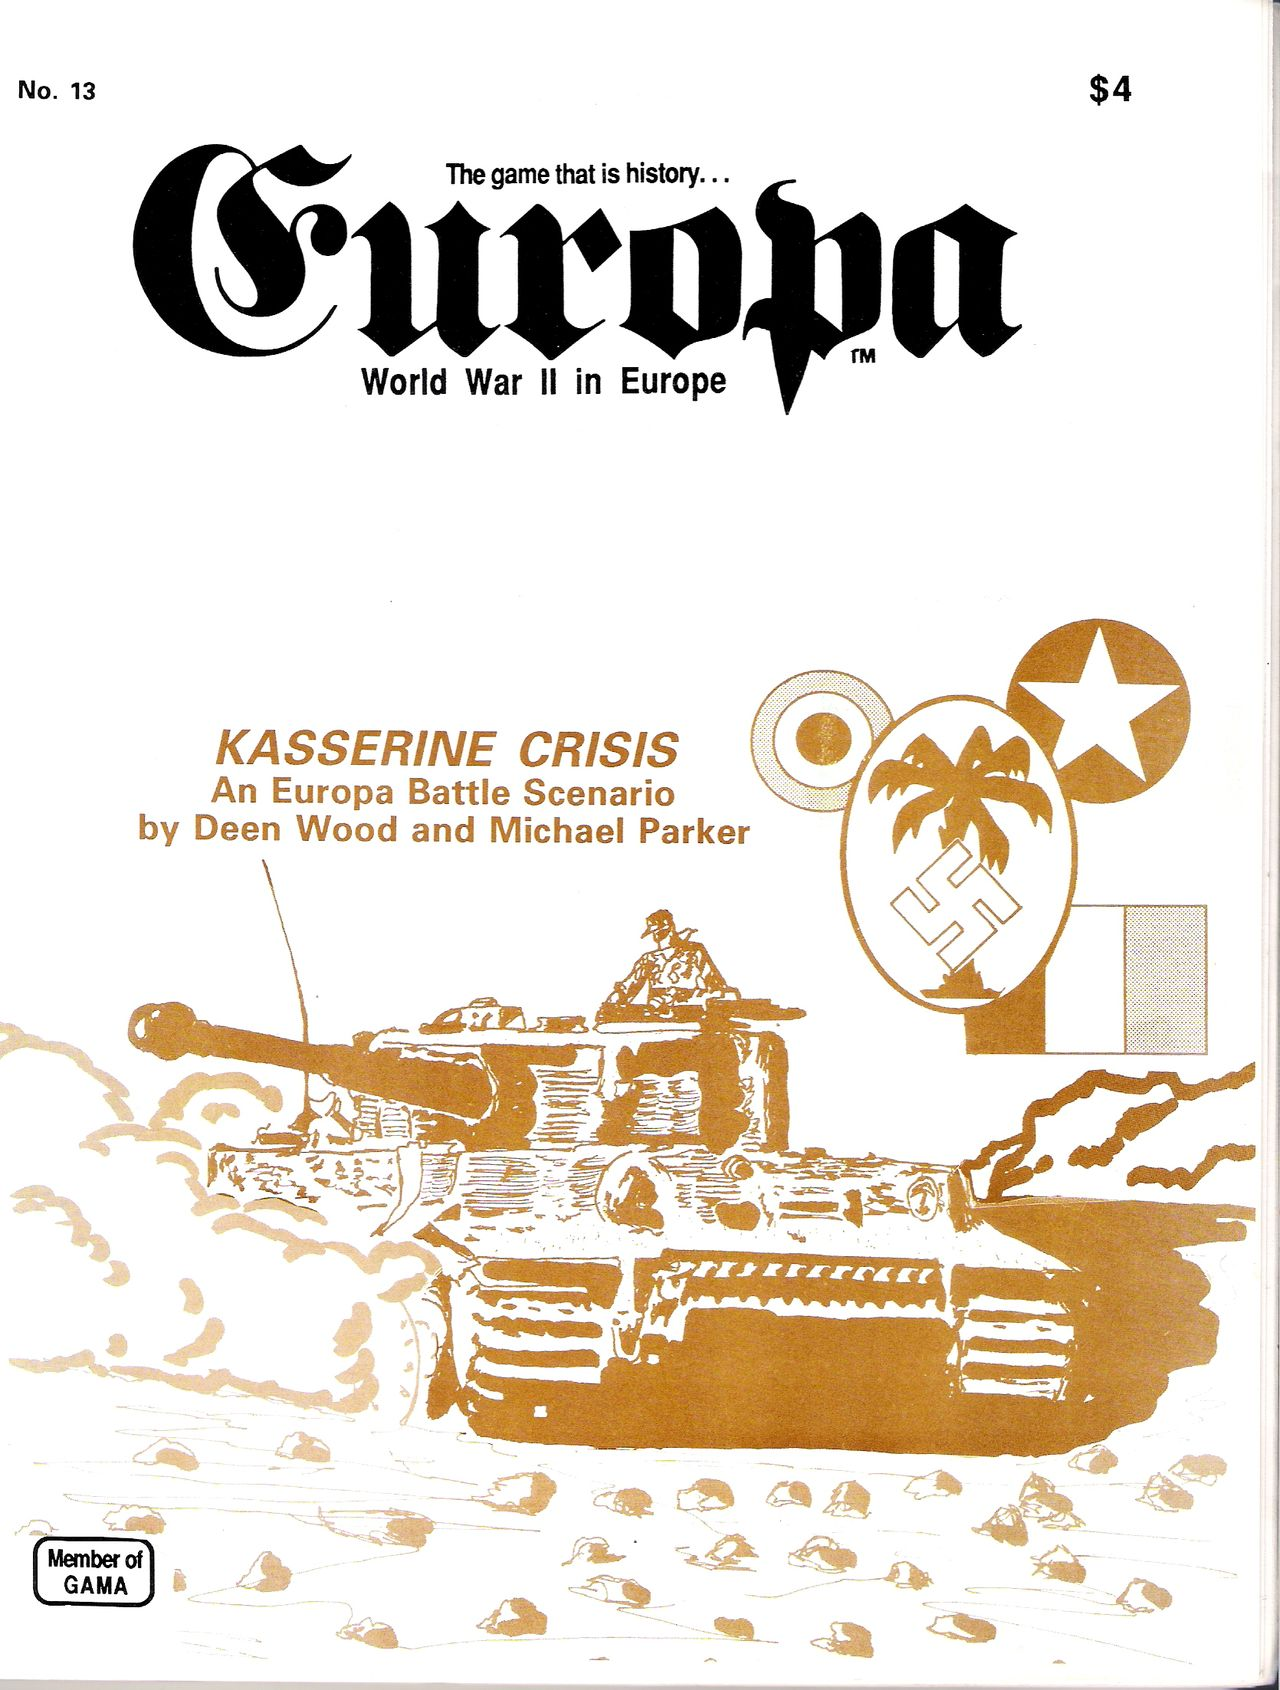 The Europa Magazine #13 - Cover